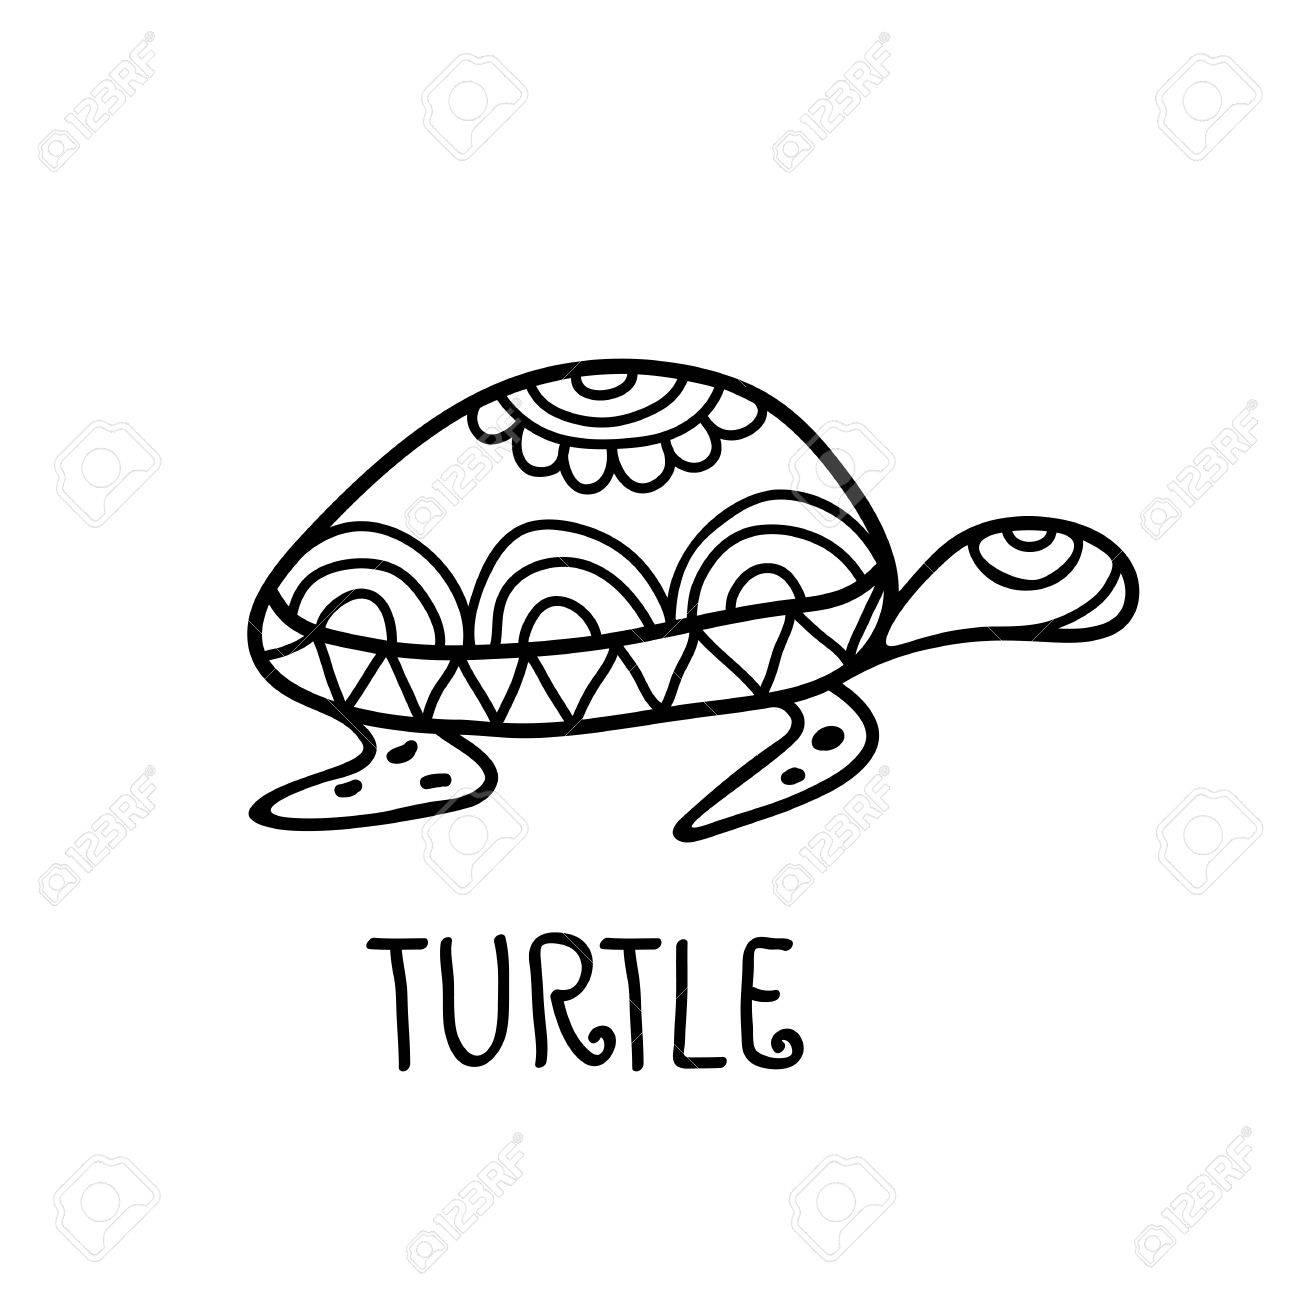 Hand drawn turtle tribal symbol vector decorative illustration hand drawn turtle tribal symbol vector decorative illustration background logo design template stock biocorpaavc